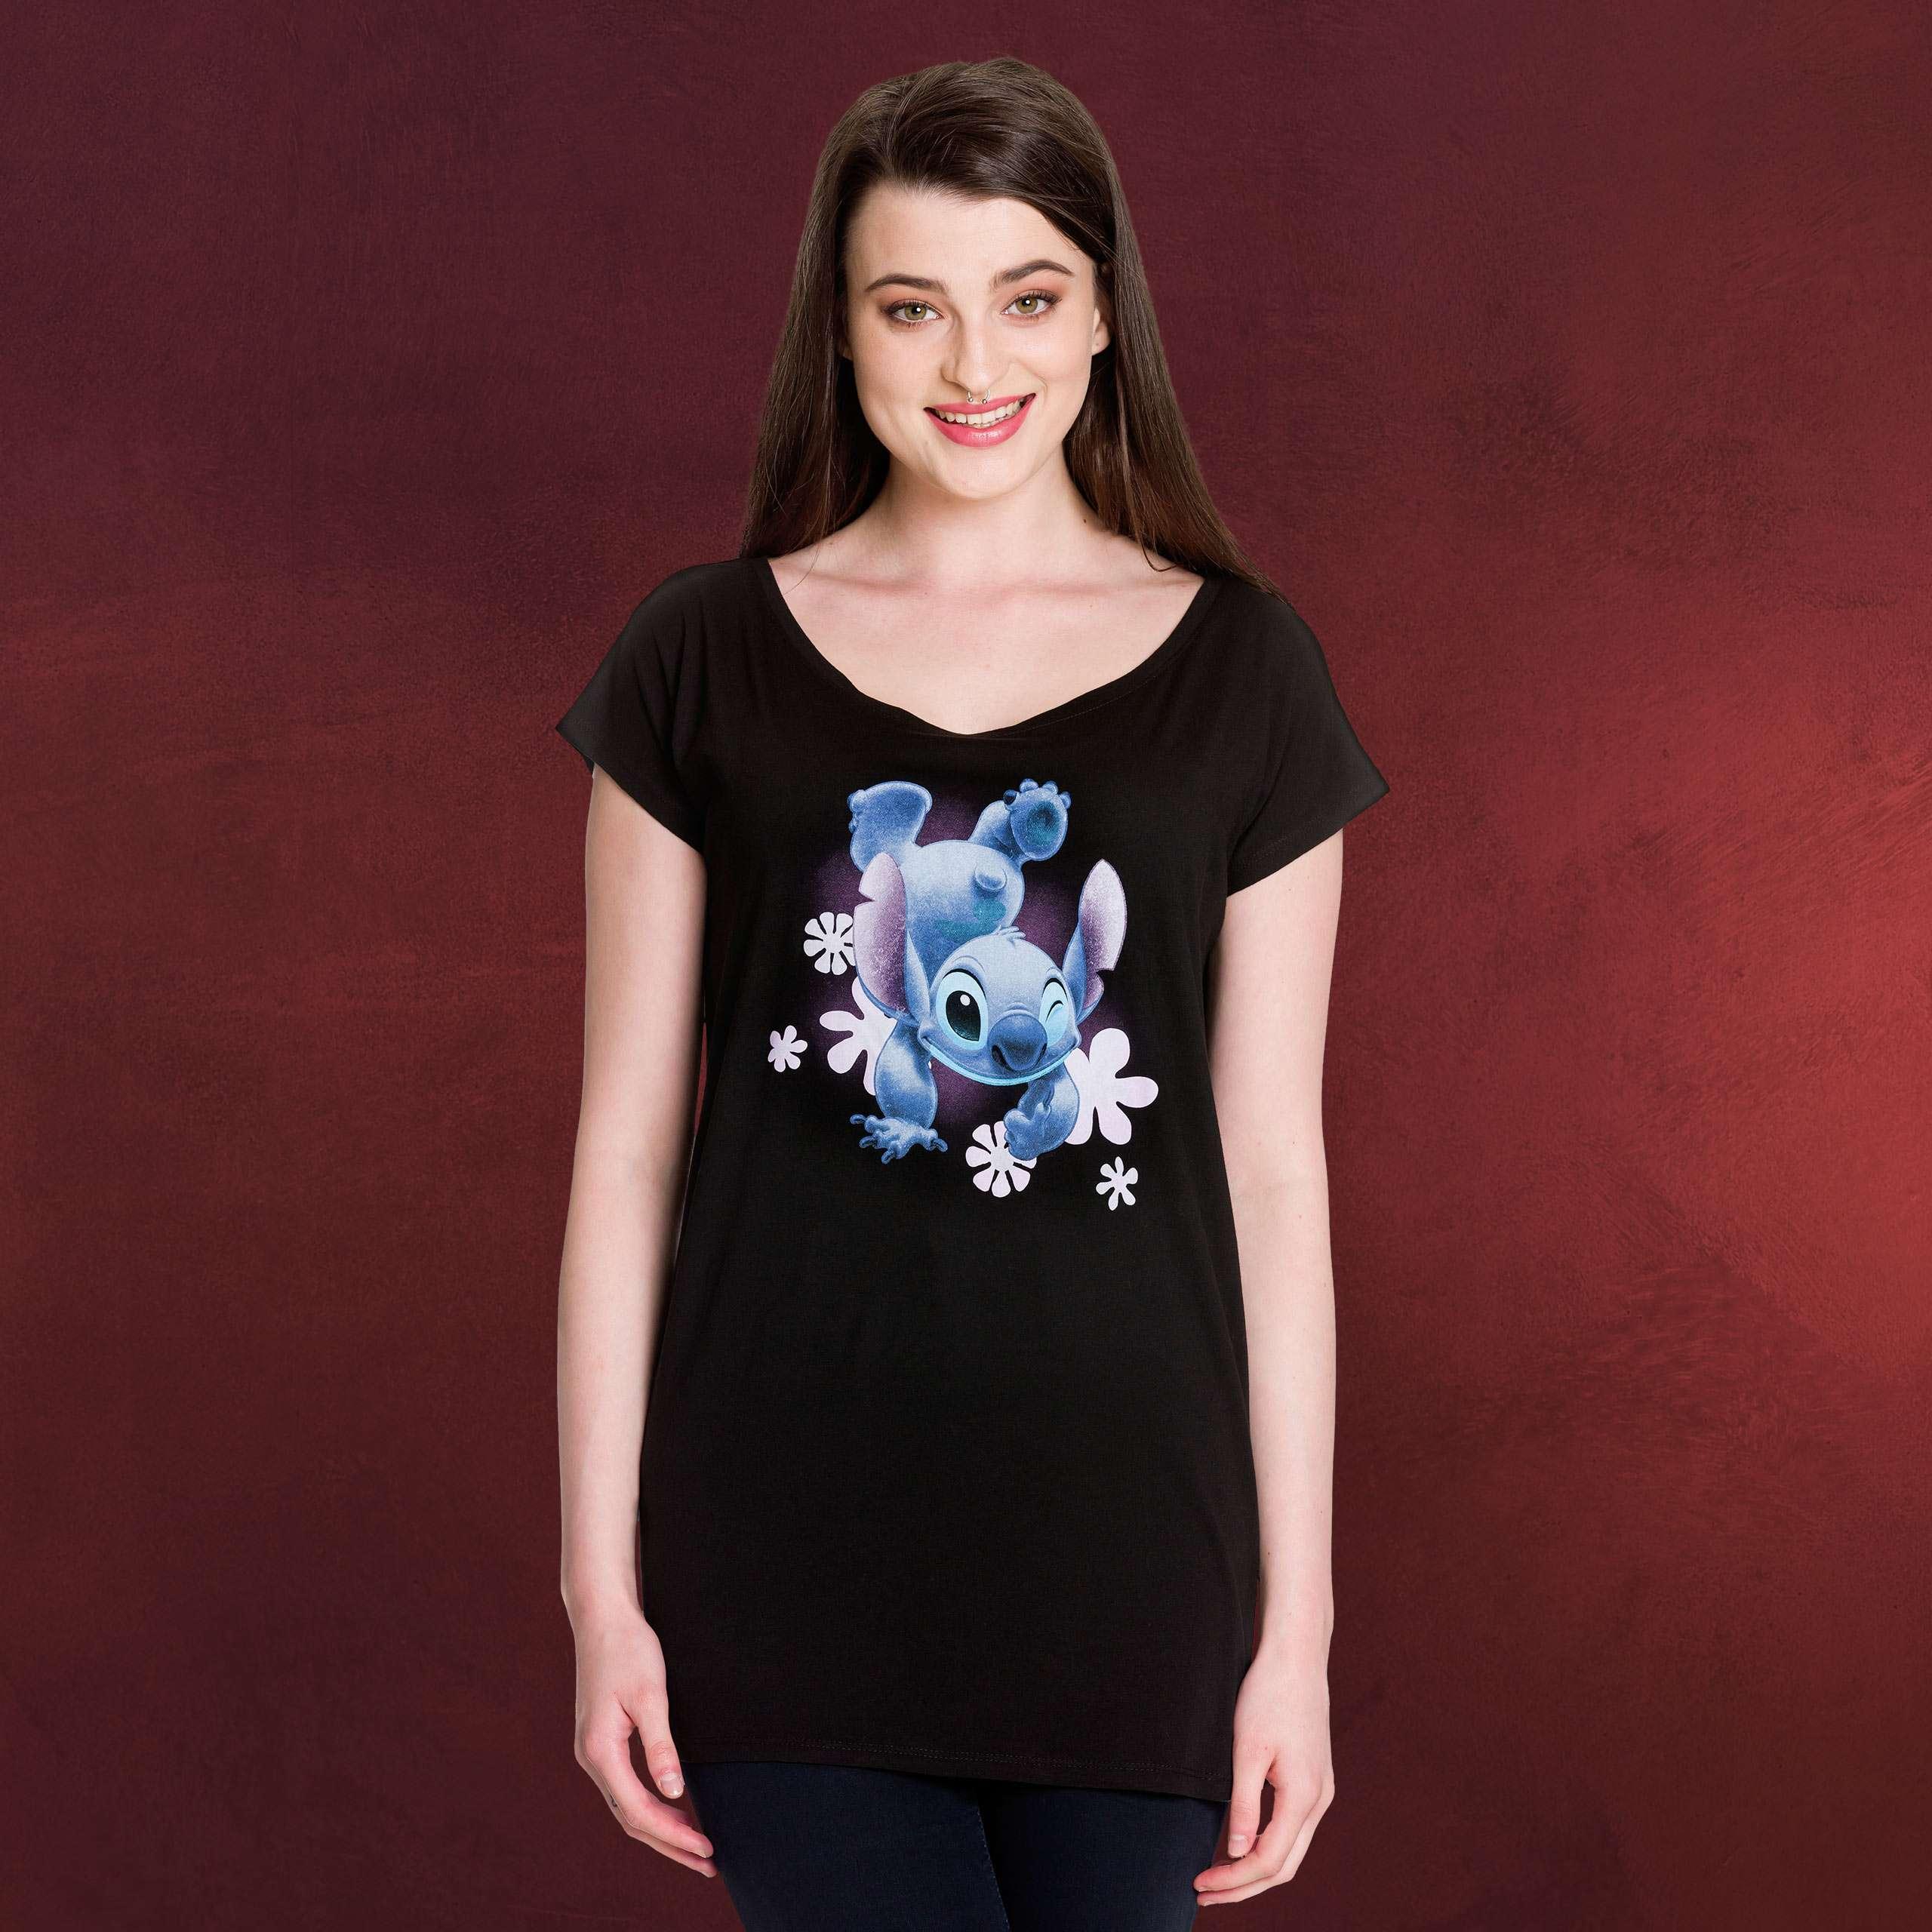 Lilo & Stitch Stitch T Shirt Damen Loose Fit schwarz